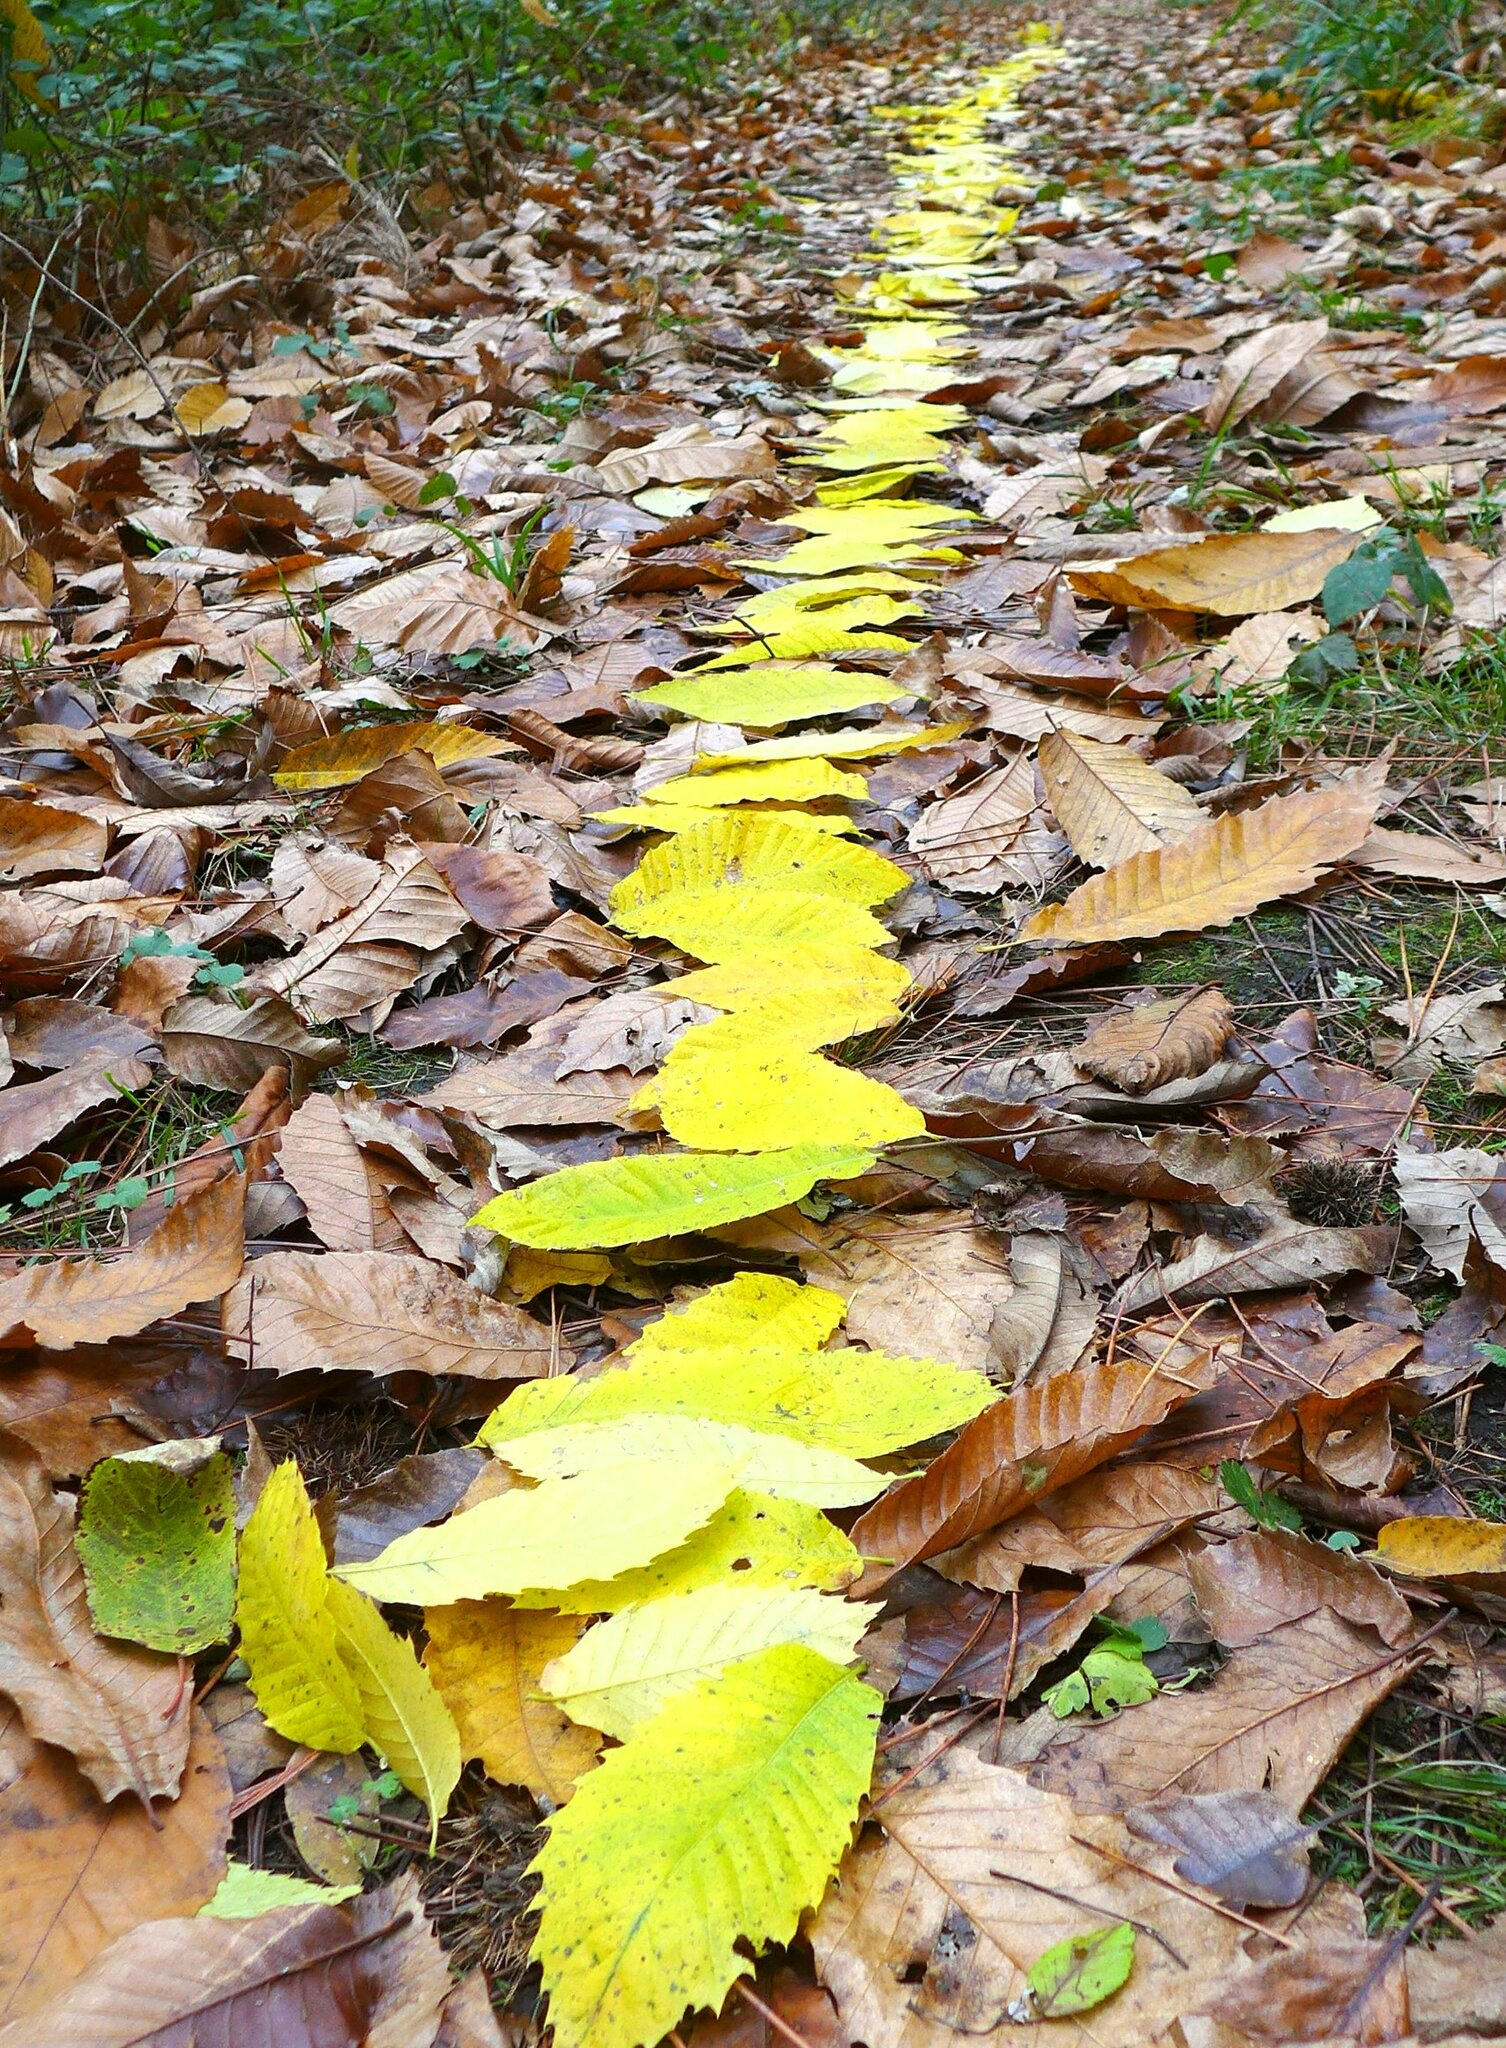 cheminer sur les feuilles mourantes yurtao